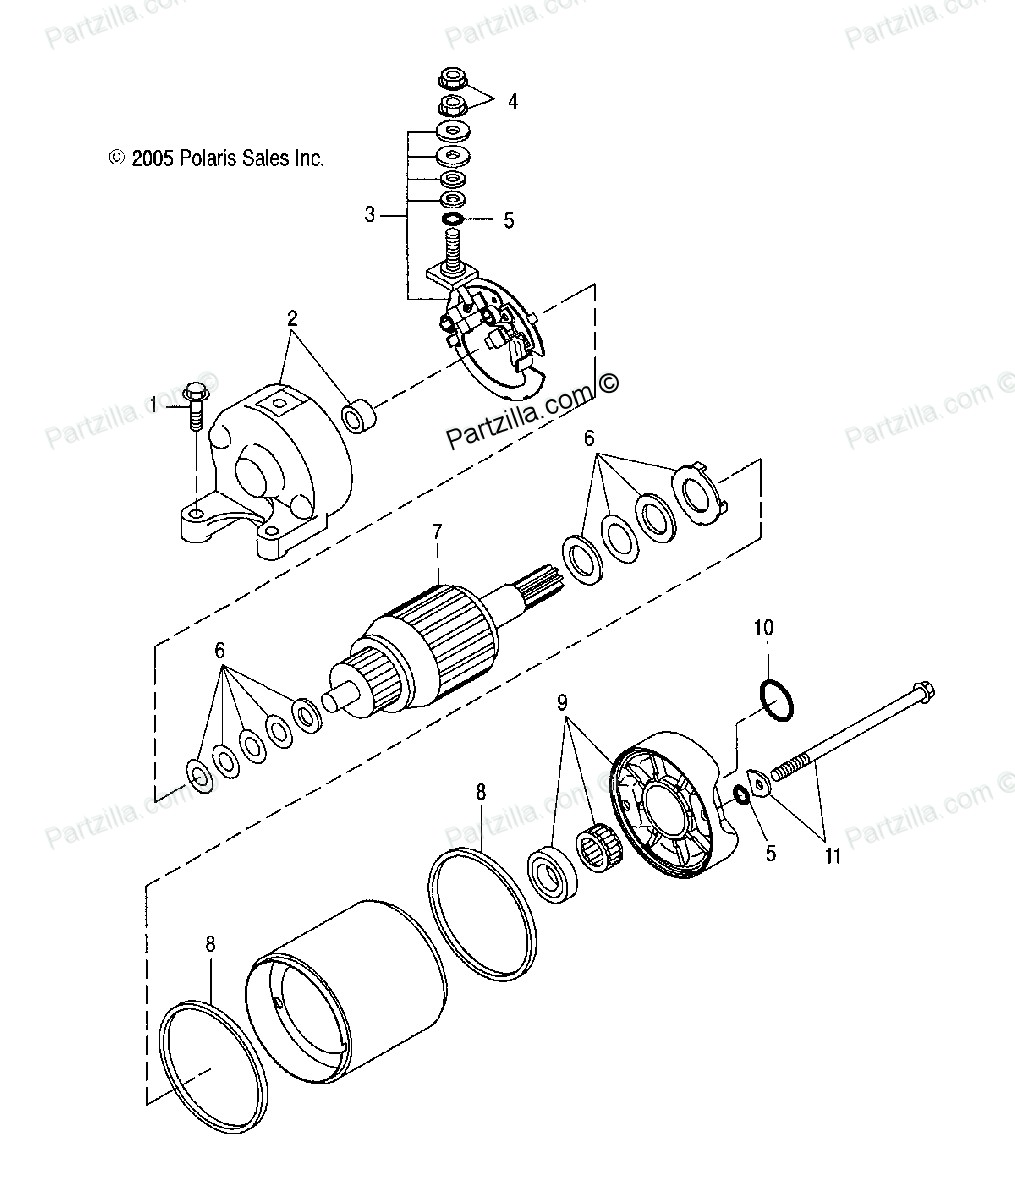 Vdo Gauges Wiring Diagrams In B C With Notes Jpg Simple Diagram Stunning